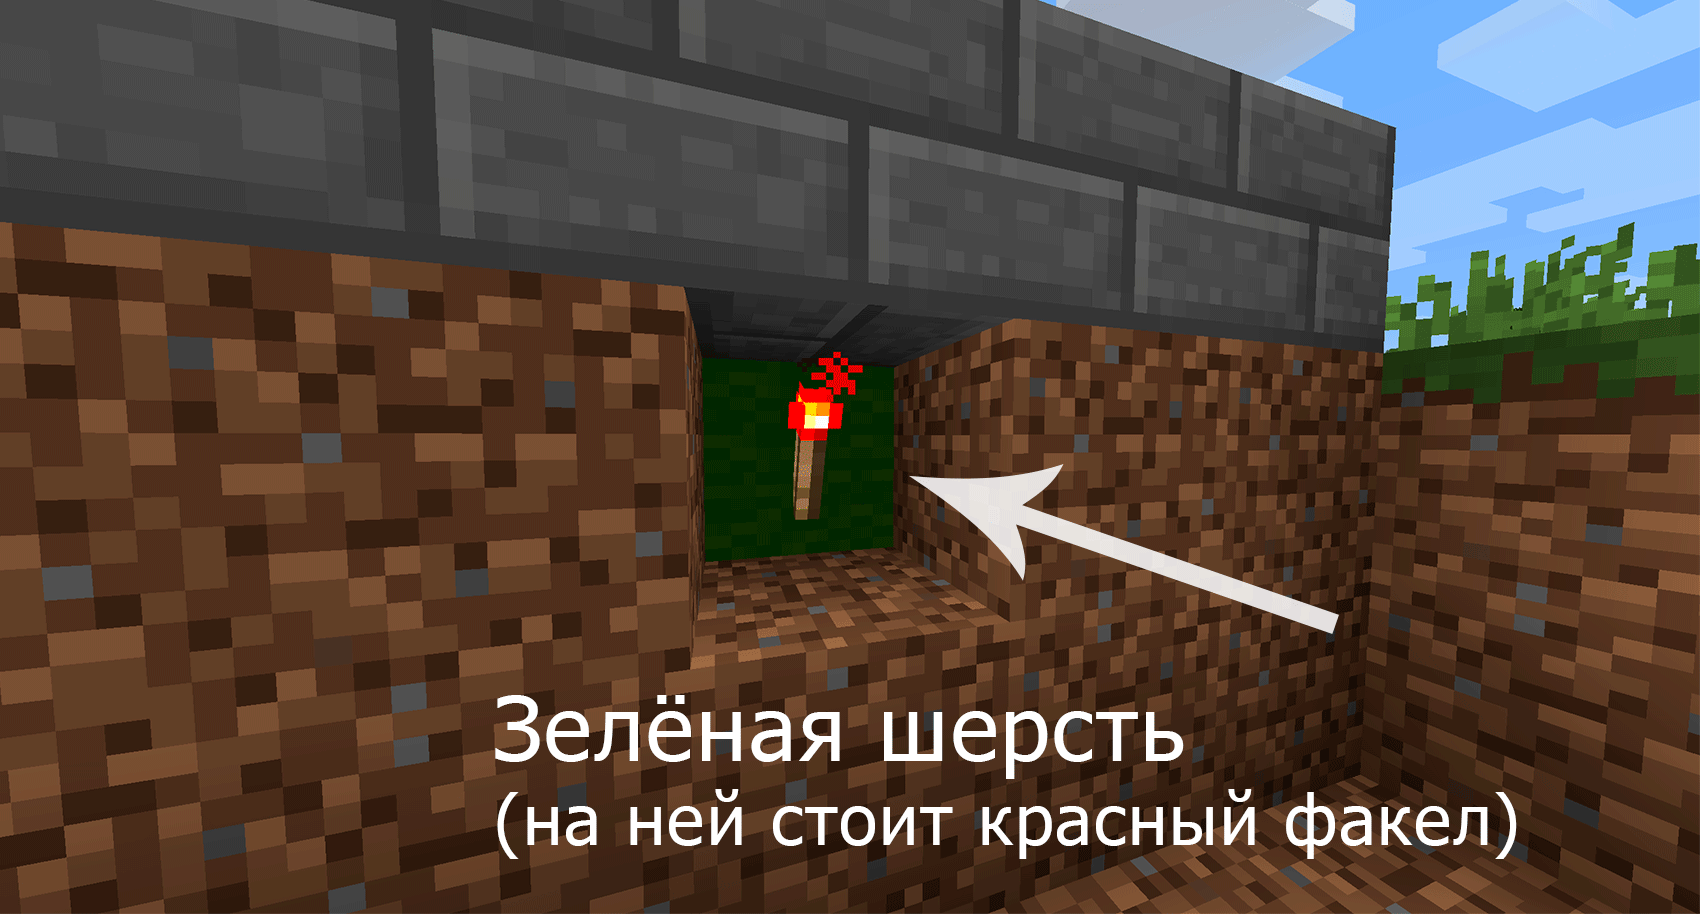 Развилка в Майнкрафт (красный факел)